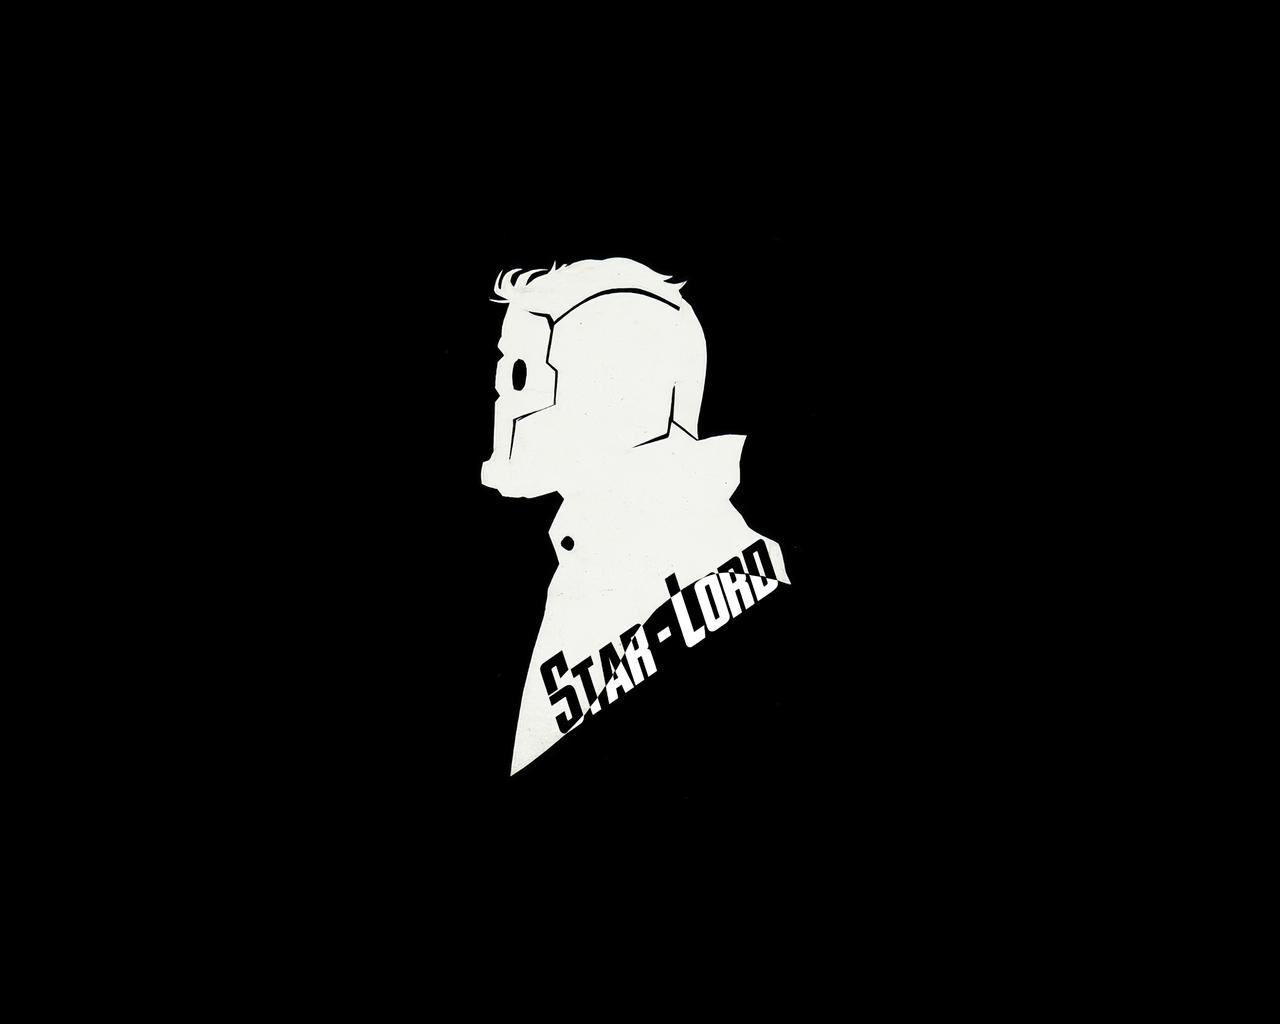 star-lord-minimal-art-4k-ml.jpg